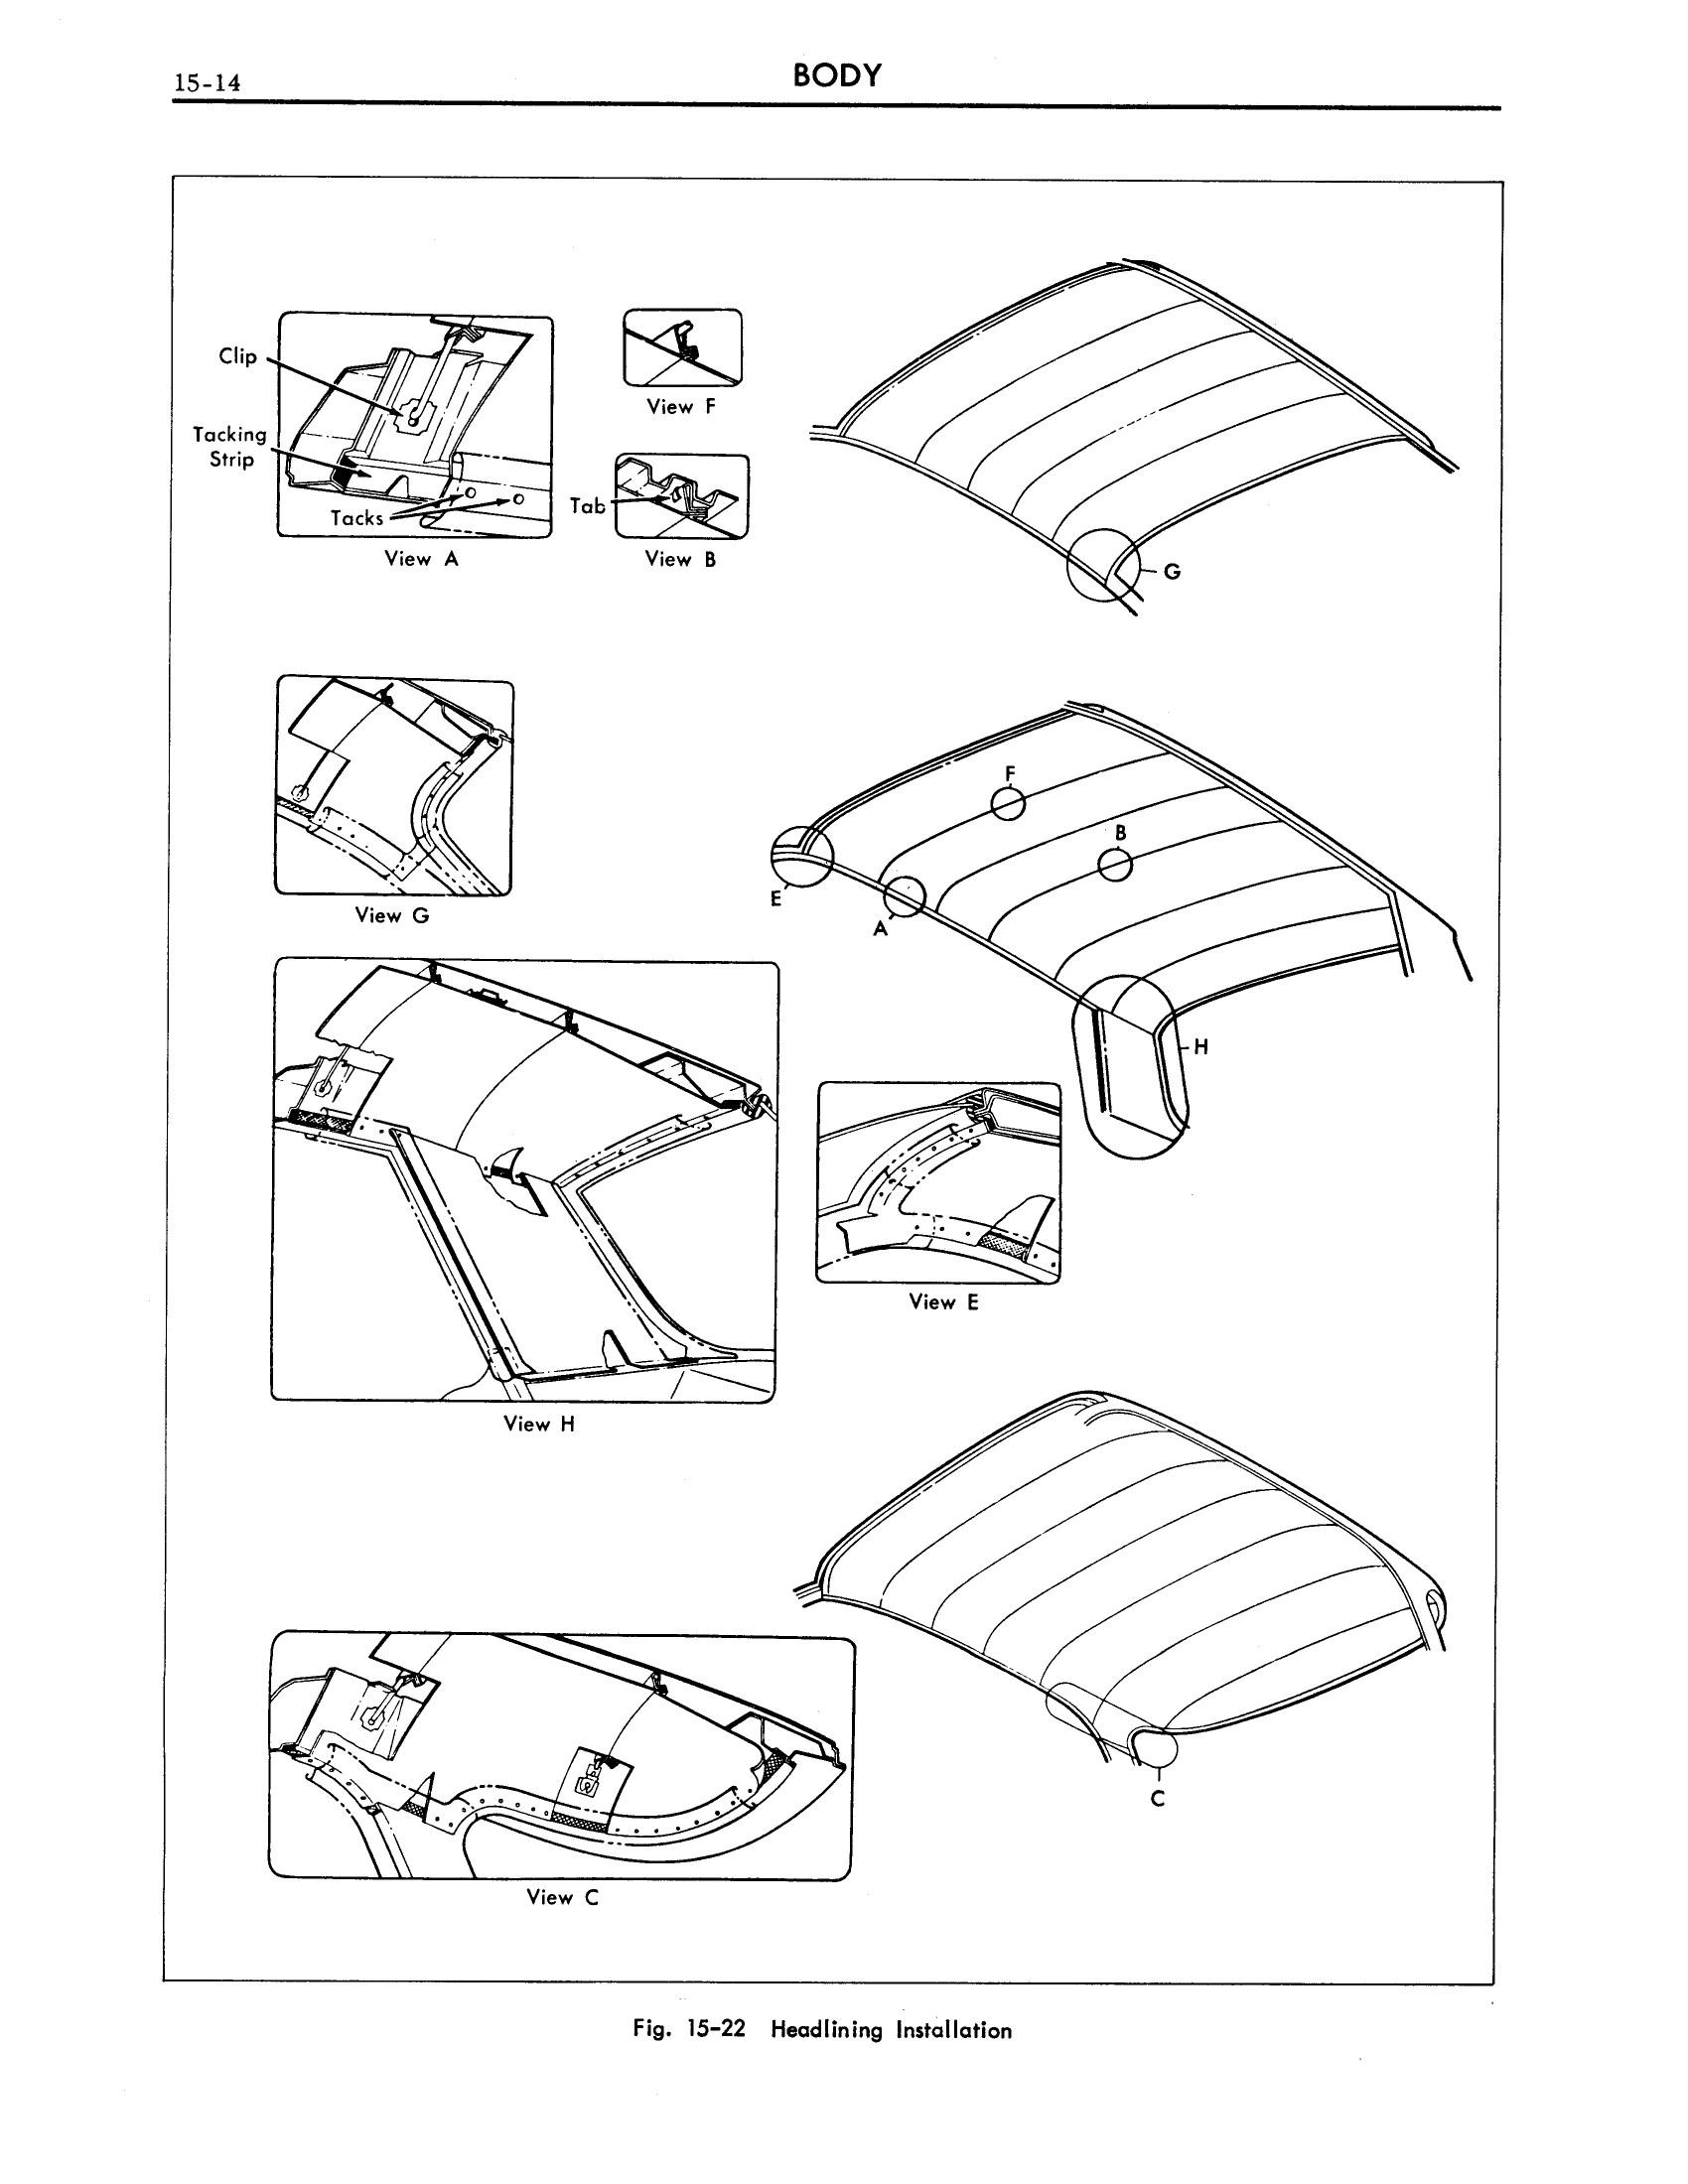 1961 Cadillac Shop Manual- Body Page 14 of 114